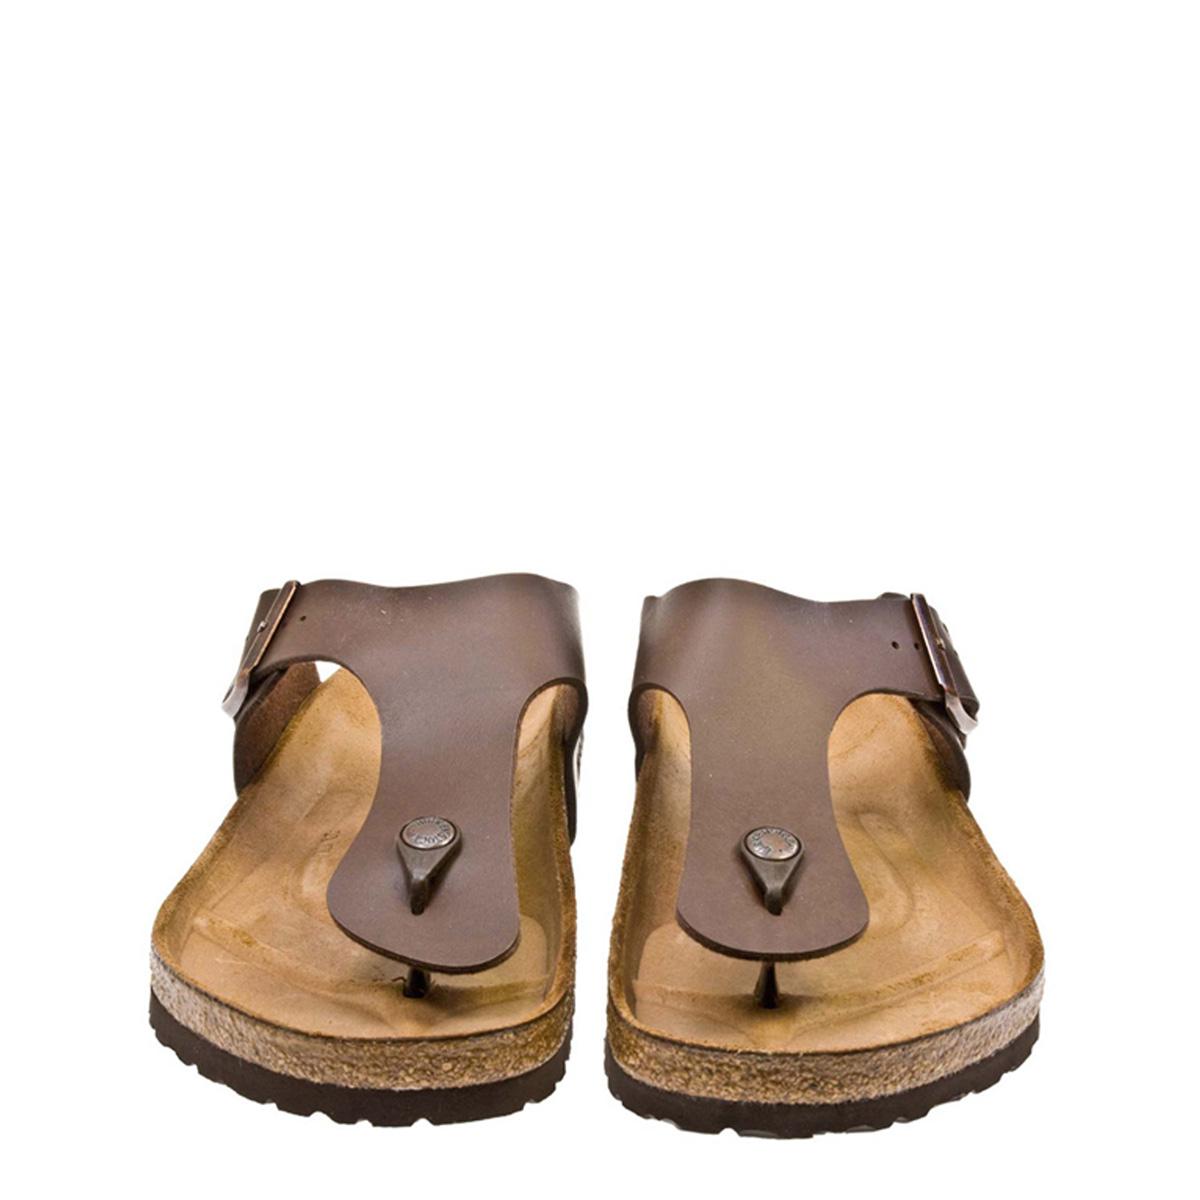 4261bff0e2bb Birkenstock s shock absorbing EVA sole completes the Ramses sandal.  Birkenstocks Style Number  044701